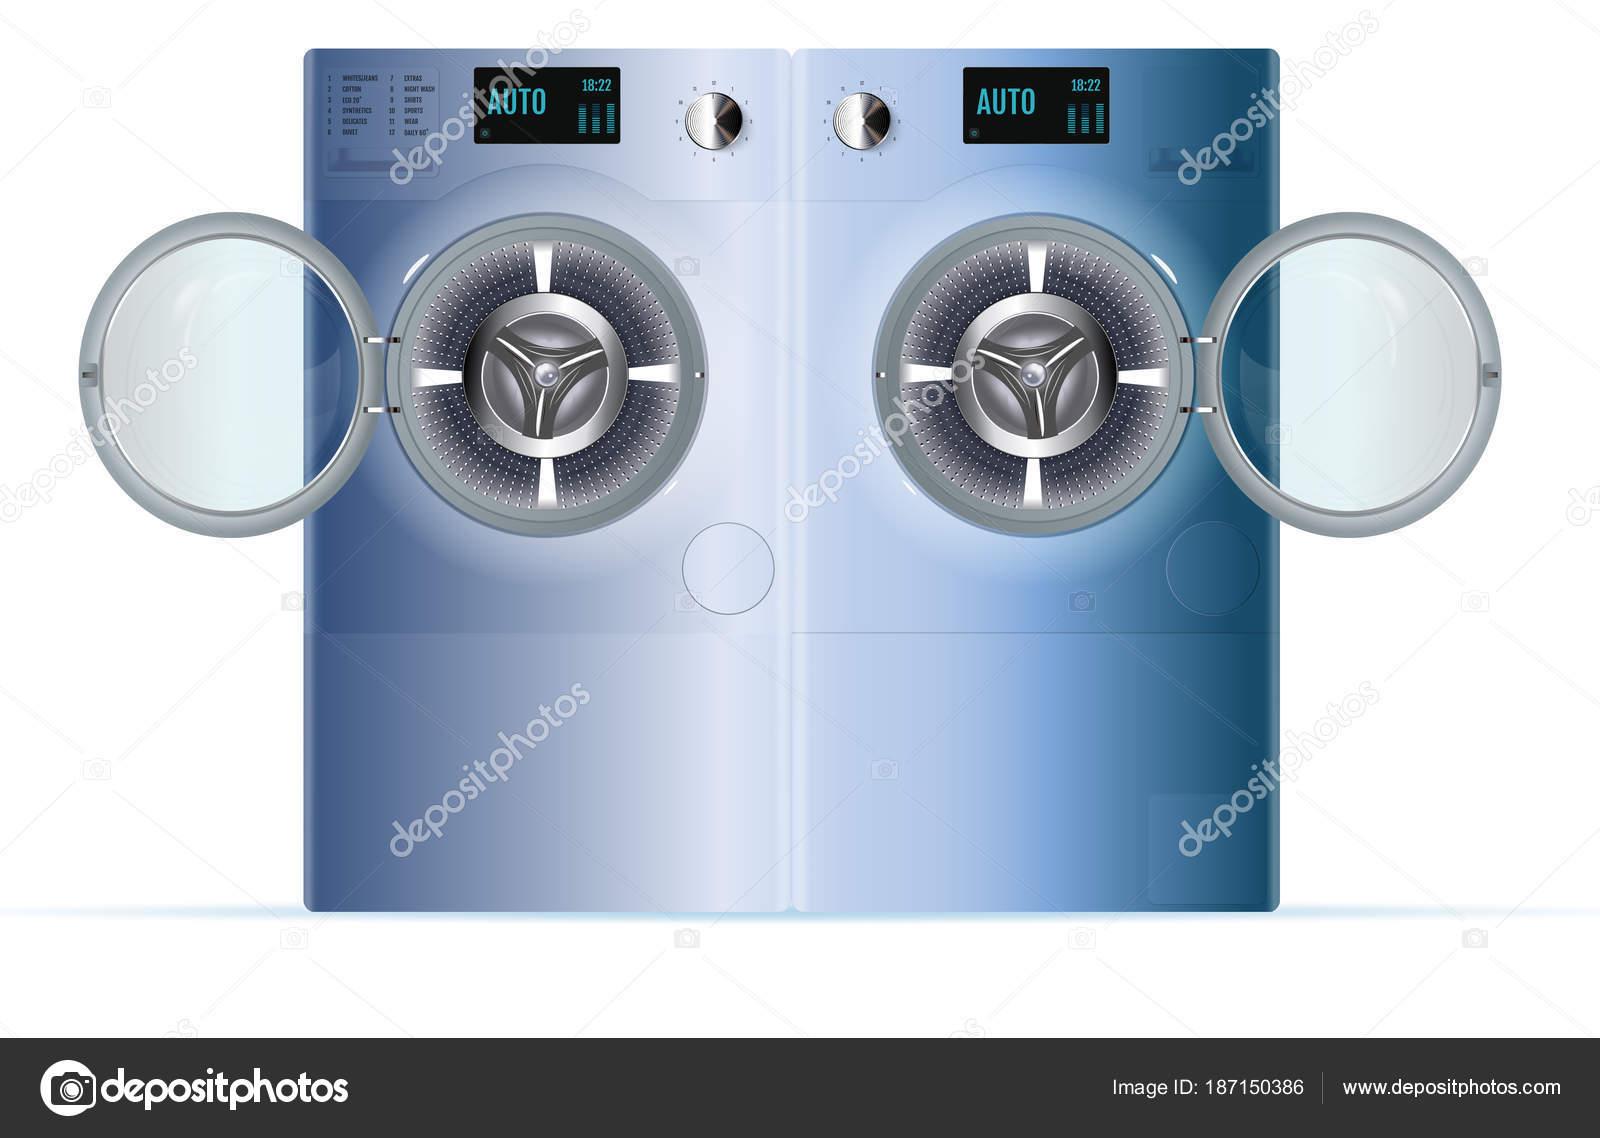 4b608f24a569 Άνοιγμα διπλό πλυντήριο ρούχων. Μπροστινή άποψη του μπλε χάλυβα ατμού  ροδέλα. Απομονωμένη πλυντήριο ρούχων σε λευκό φόντο — Διάνυσμα με ...